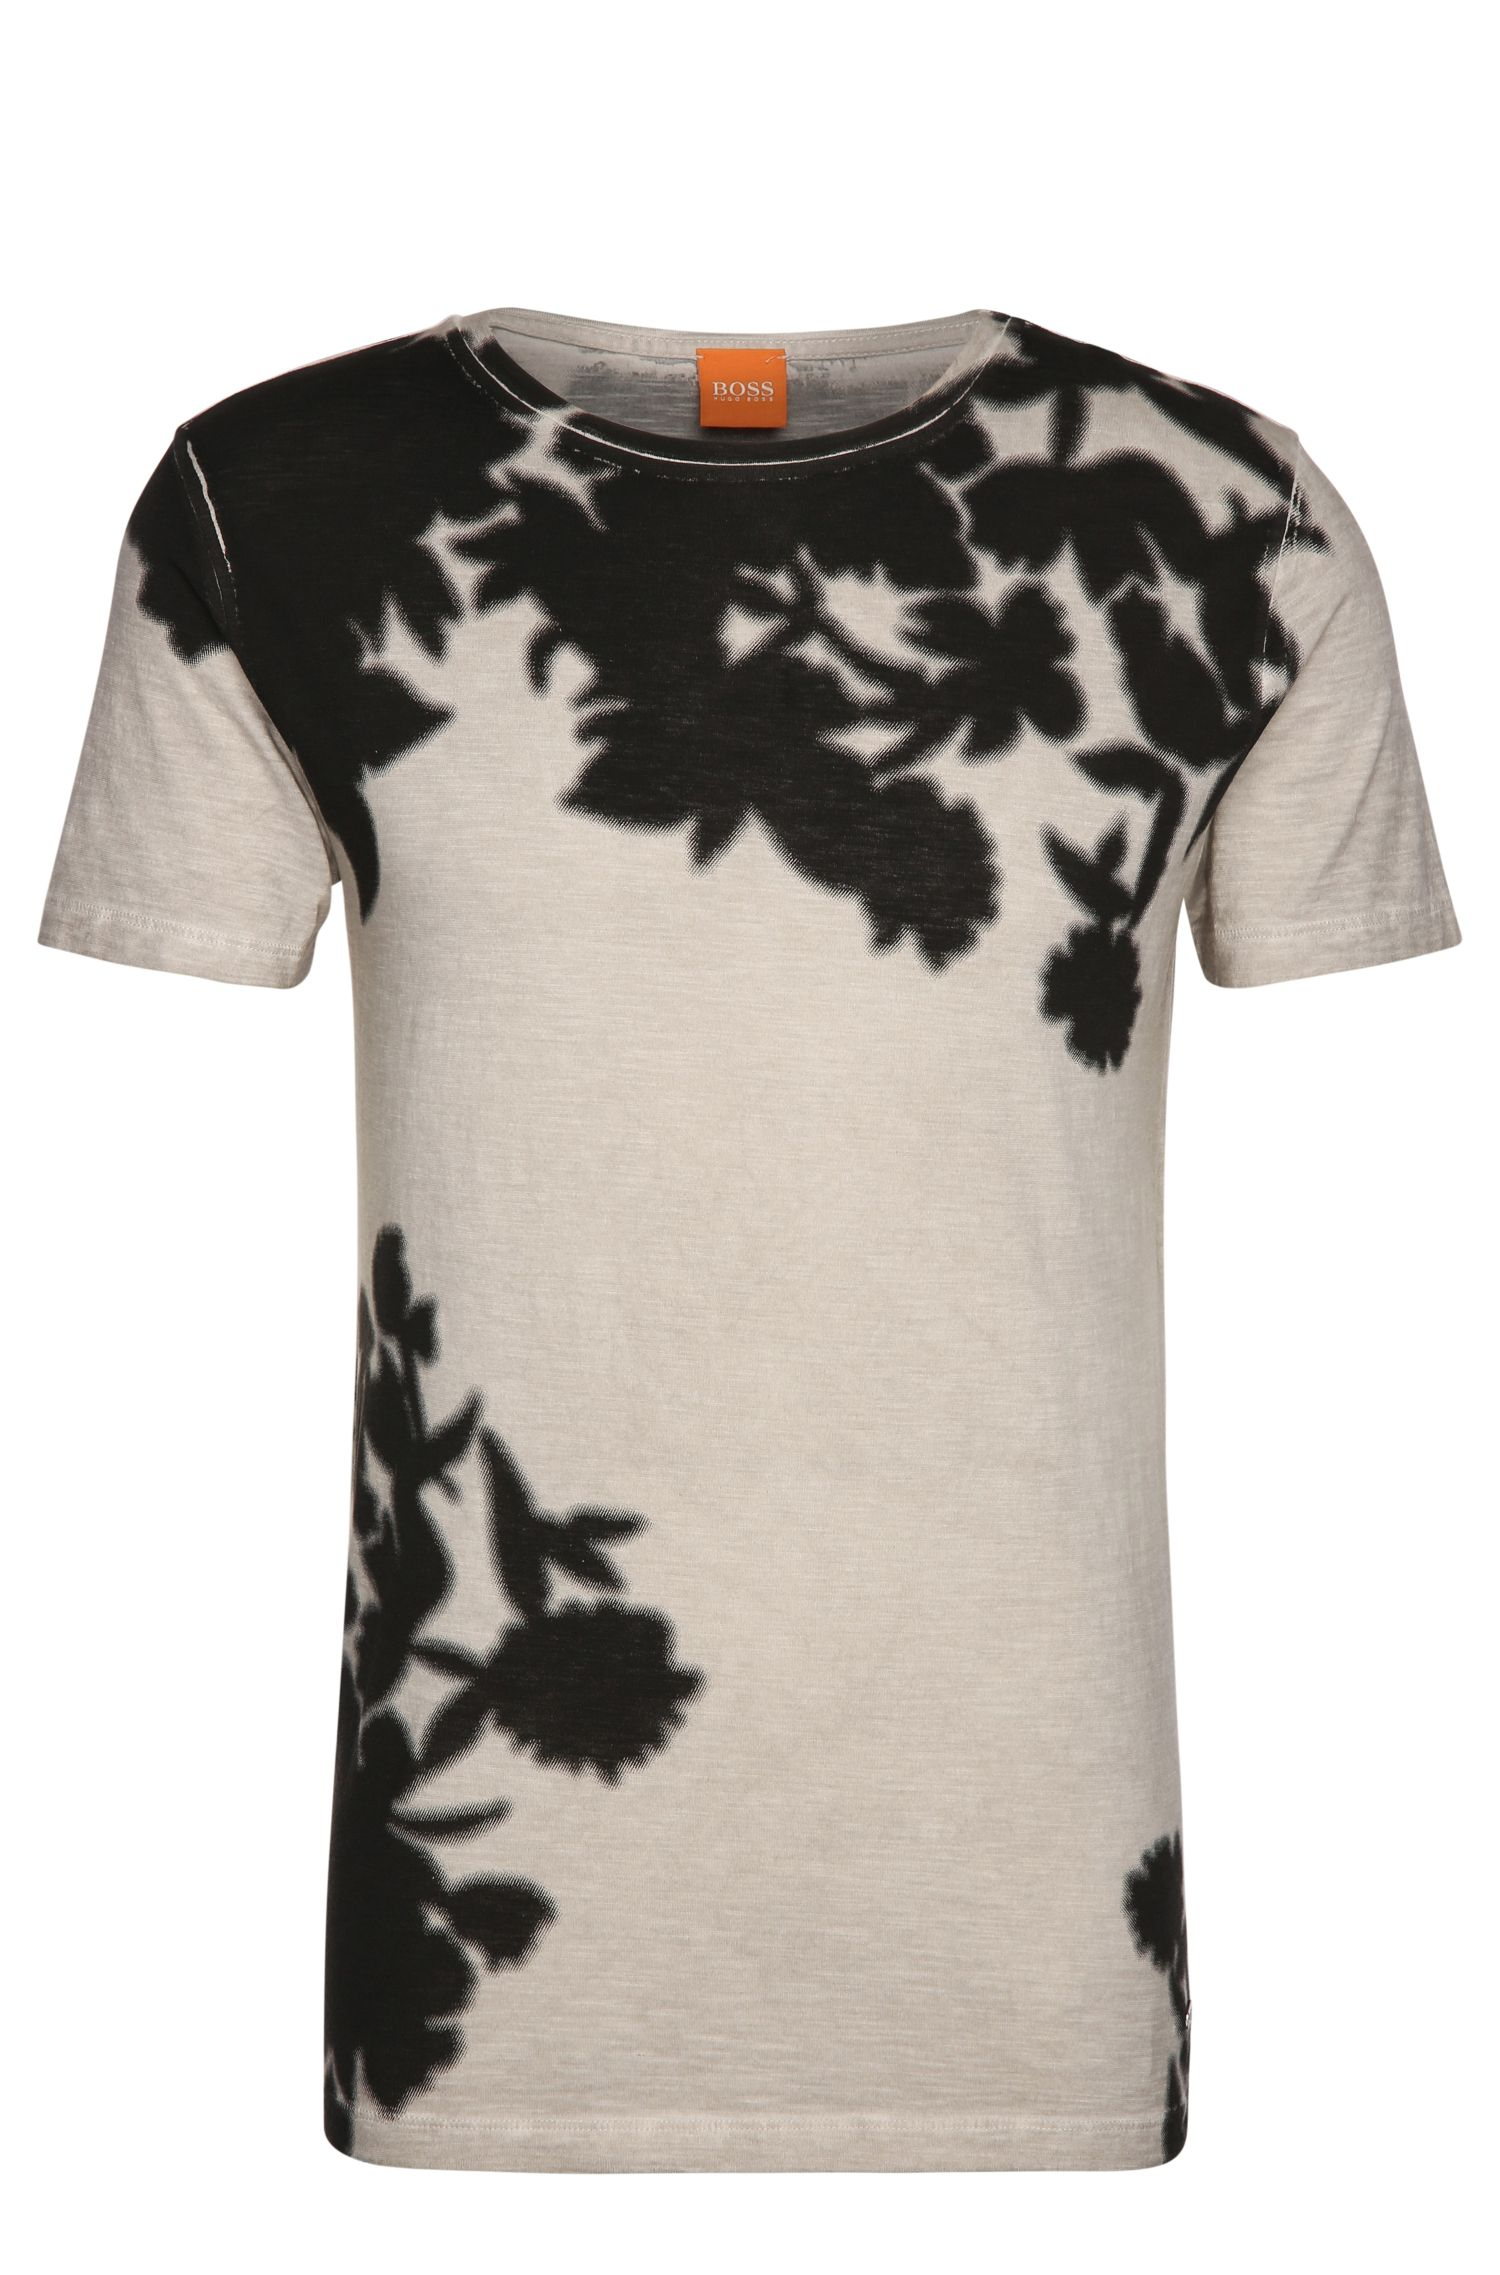 Camiseta de punto teñida en prenda elaborada en algodón: 'Trusted'